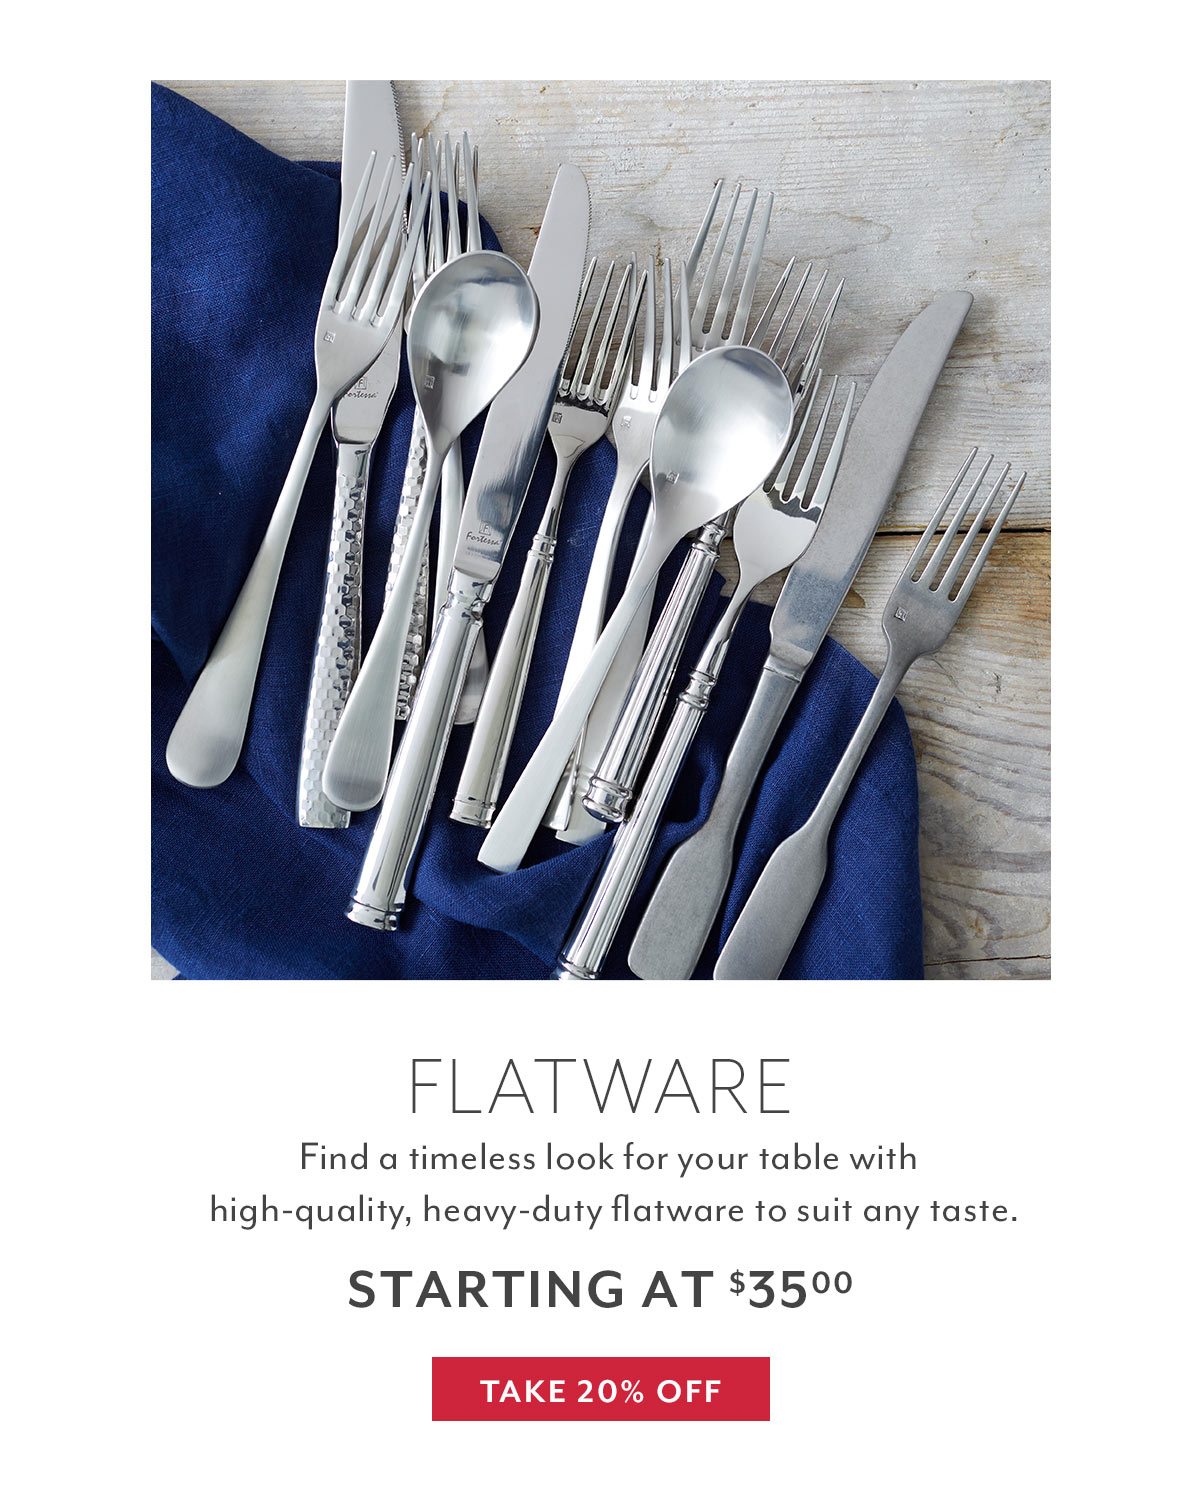 Flatware Sets